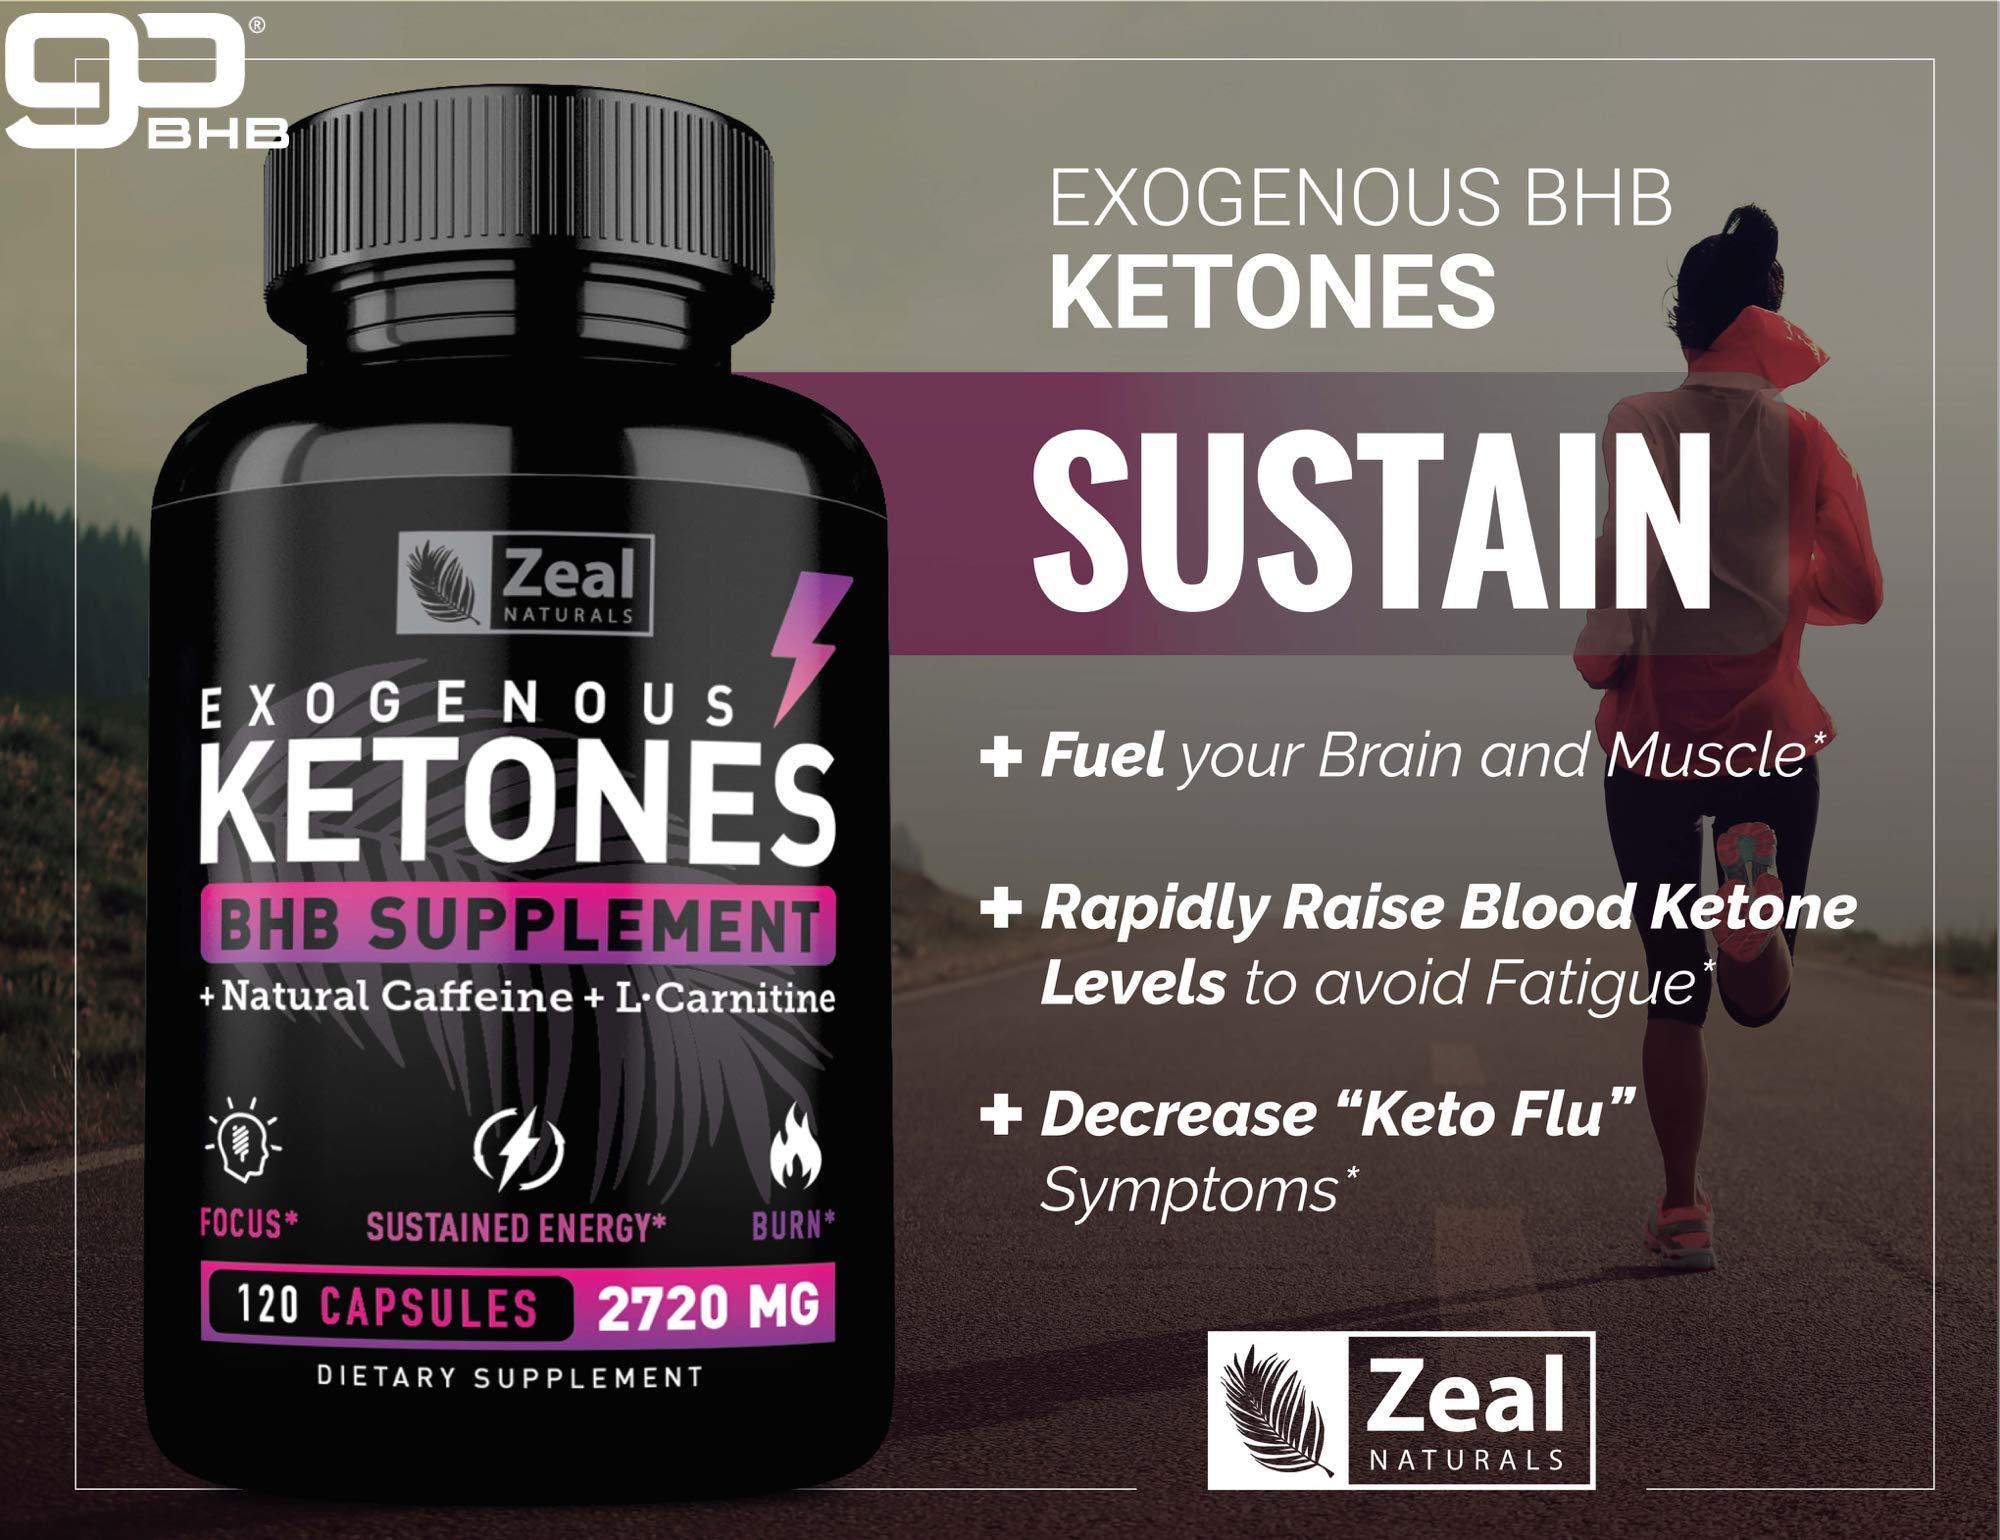 Keto BHB Exogenous Ketones Pills (2720mg | 120 Capsules) Keto Pills w. goBHB Salts, Natural Caffeine & L-Carnitine - Keto BHB Oil Capsules Beta Hydroxybutyrate for Weight Loss Keto Vitamins Keto Salts by Zeal Naturals (Image #5)